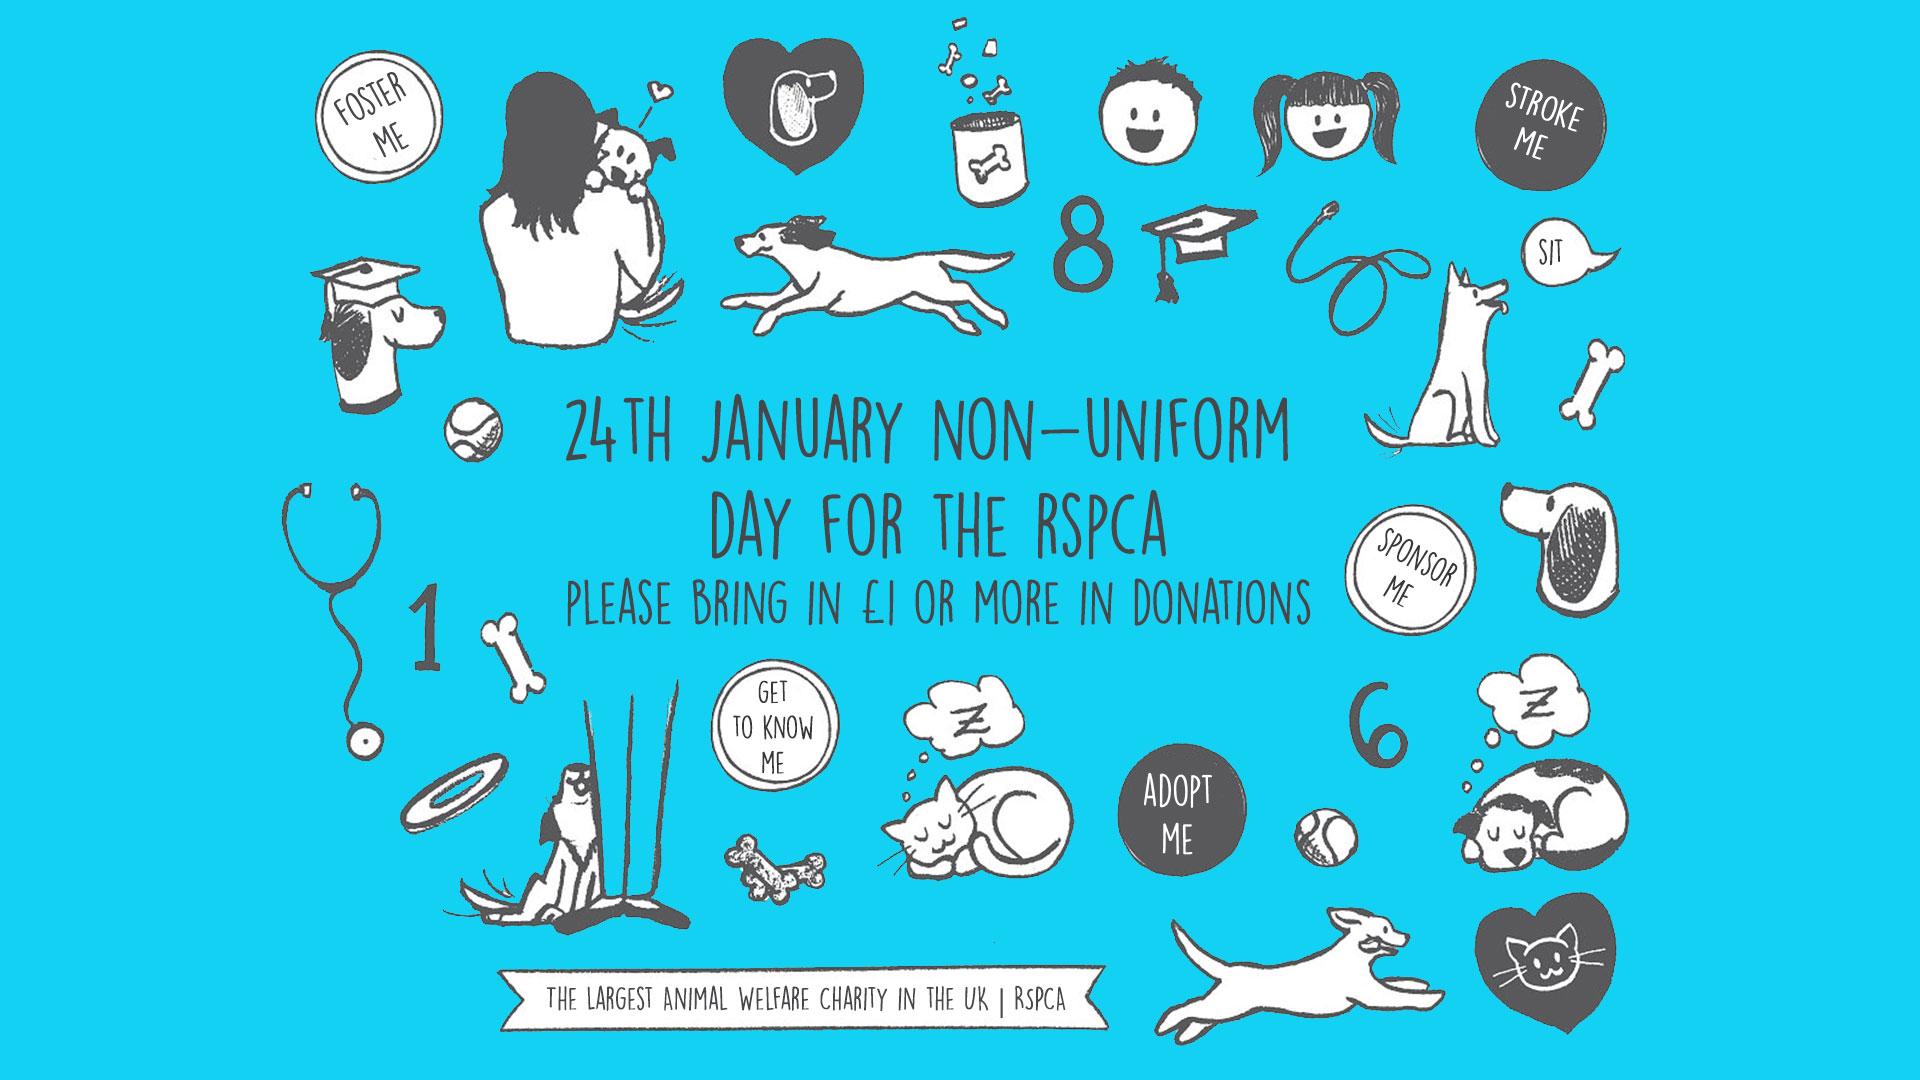 Non-uniform day 24th January